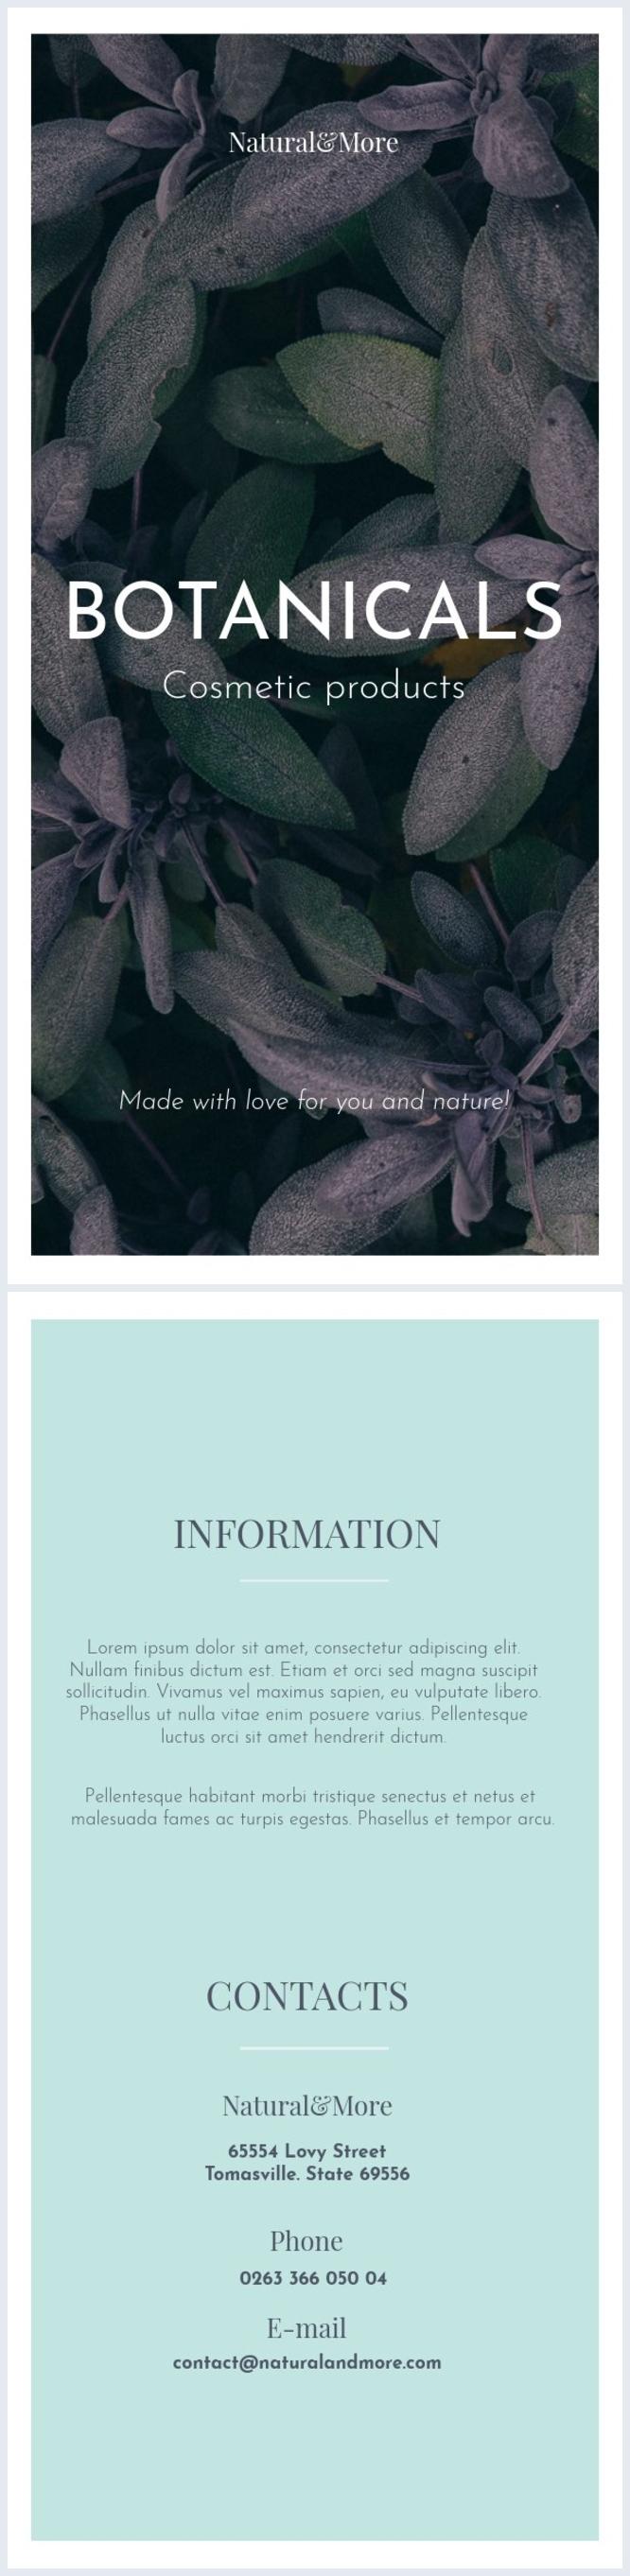 Organic Cosmetics Flyer